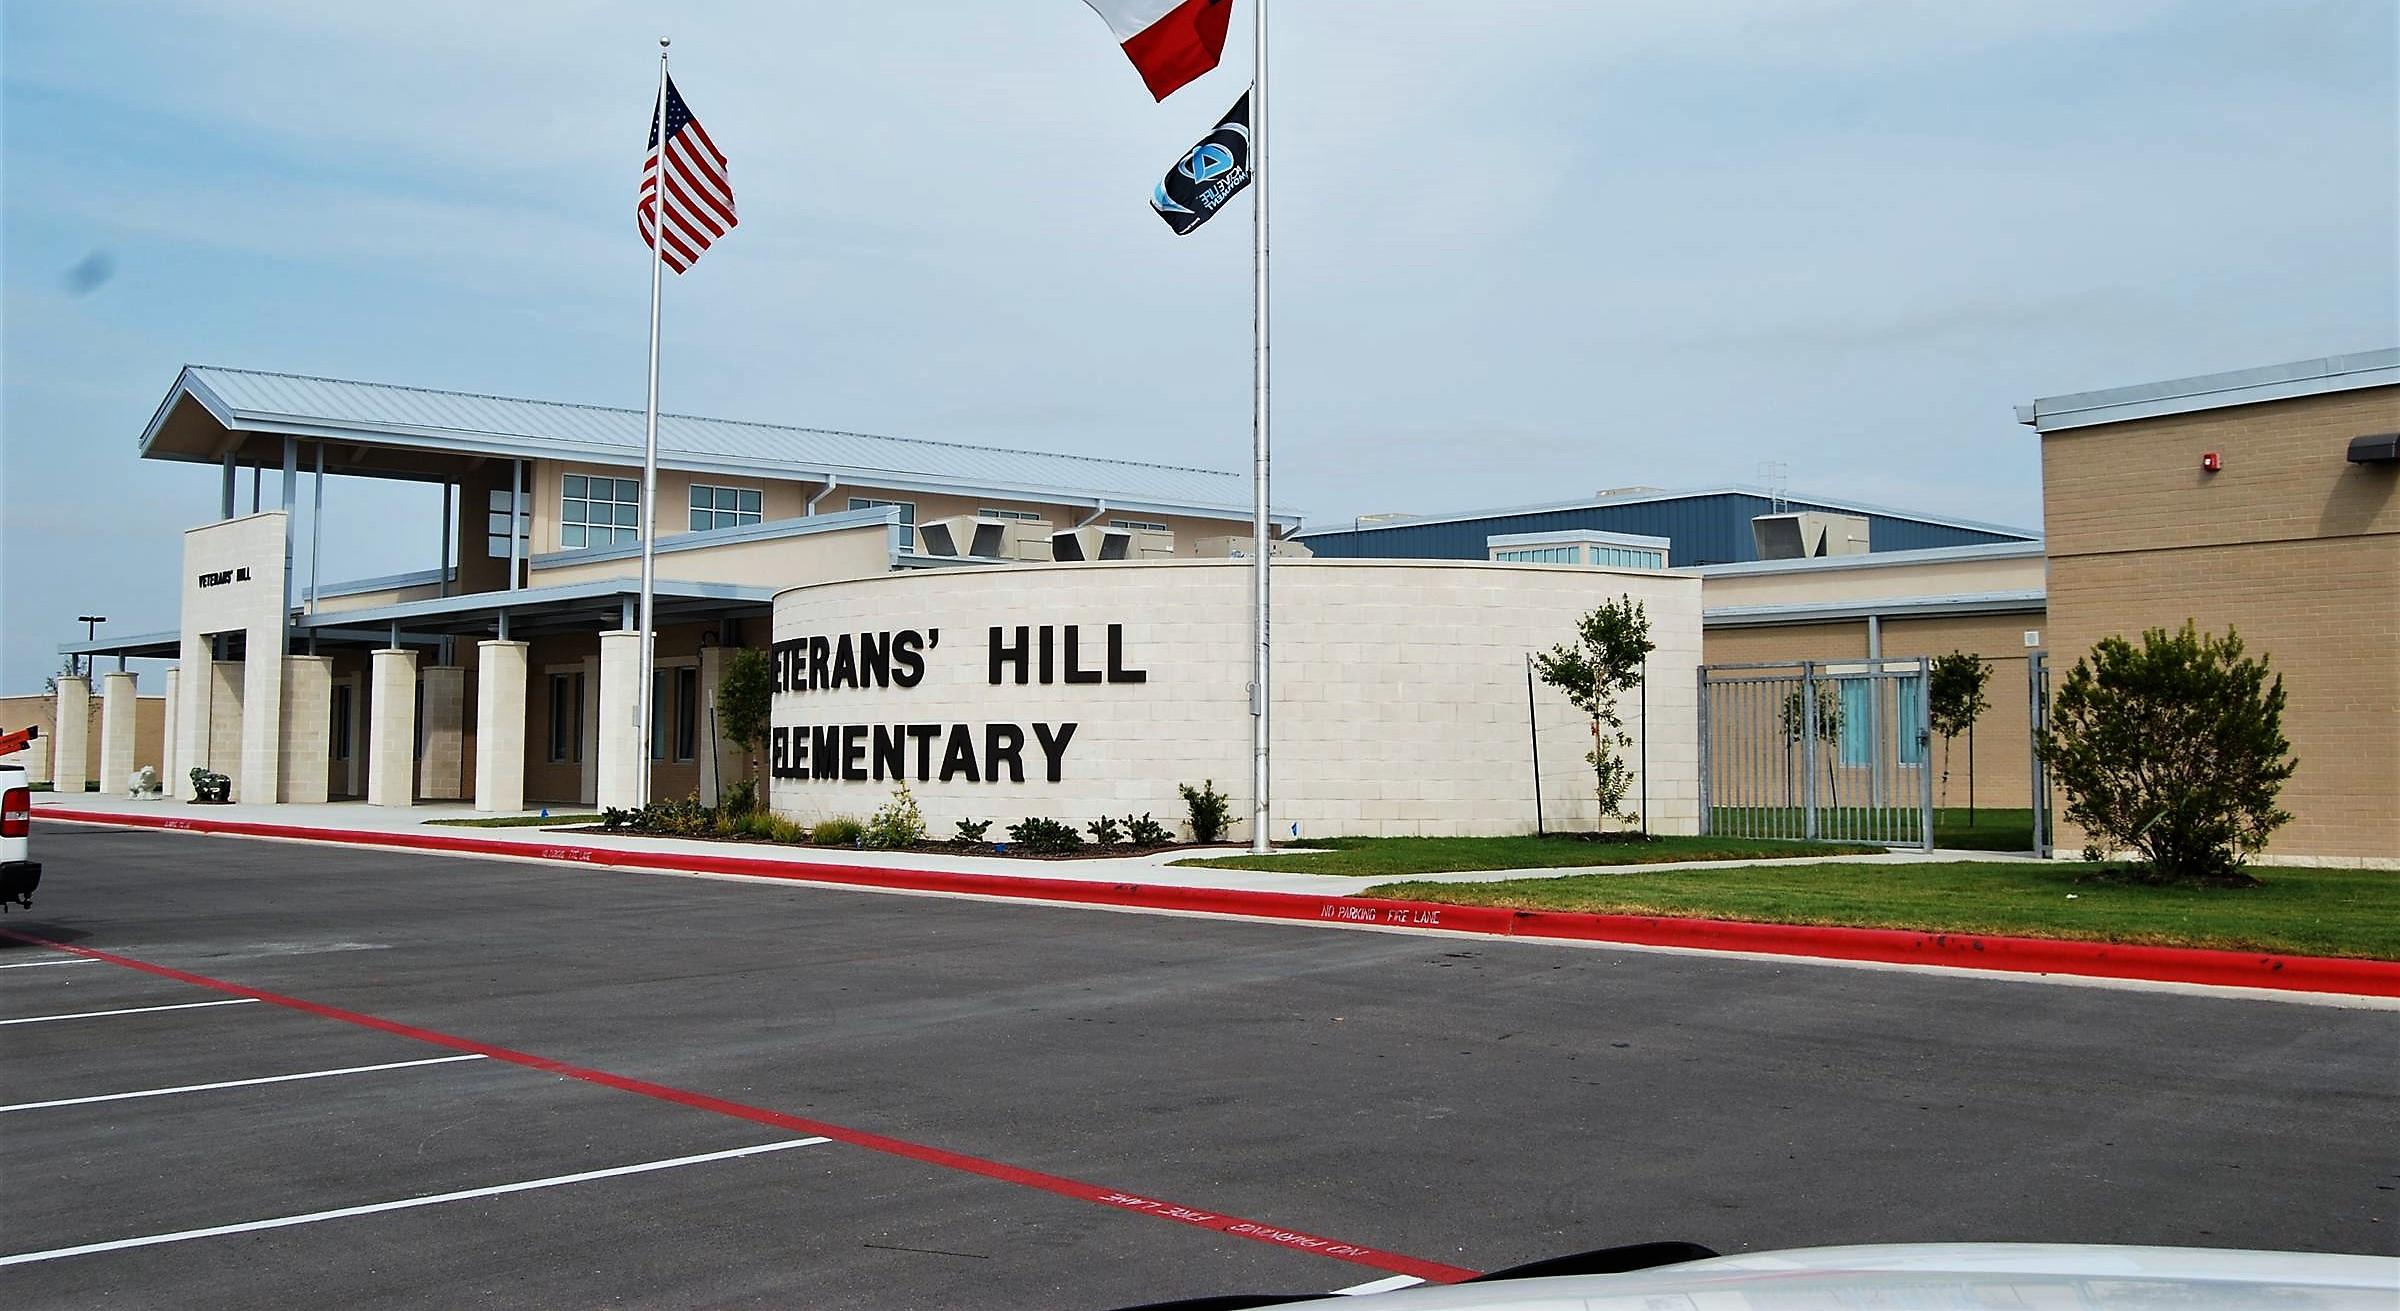 Veteran's Hill Elementary